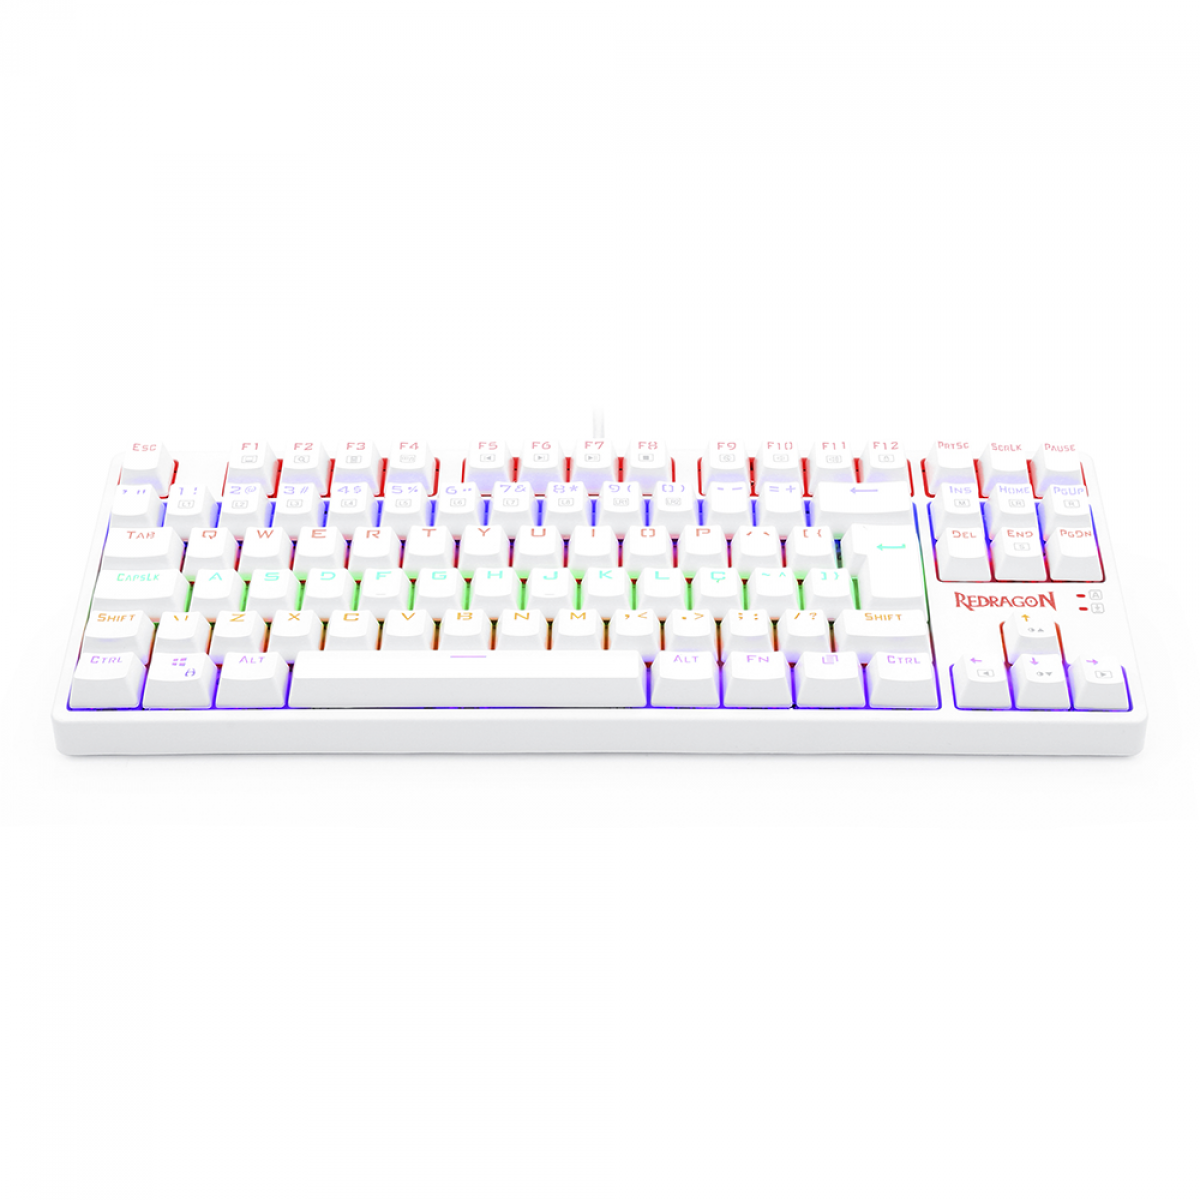 Teclado Mecânico Gamer Redragon Daksa Rainbow, Switch Blue Removíveis, ABNT2, White, K576W-R PT-BLUE